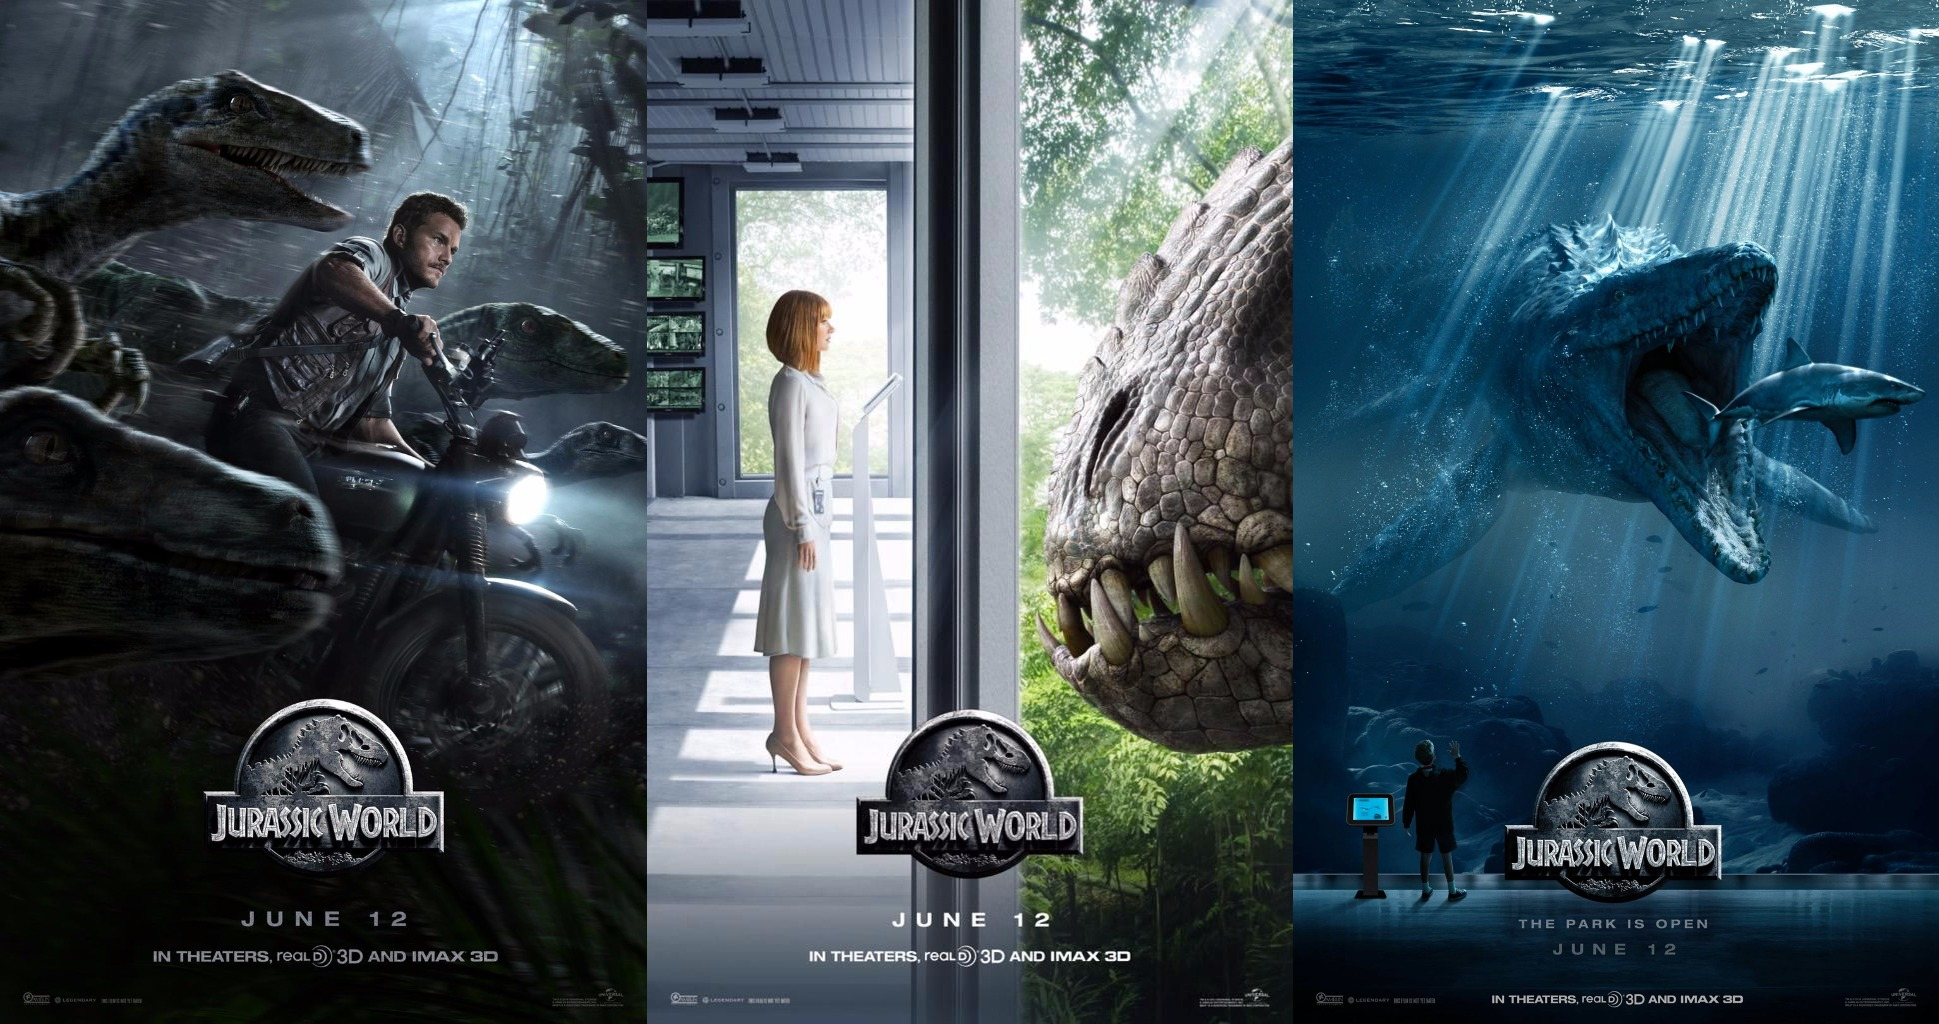 world 2015 movie poster - photo #38